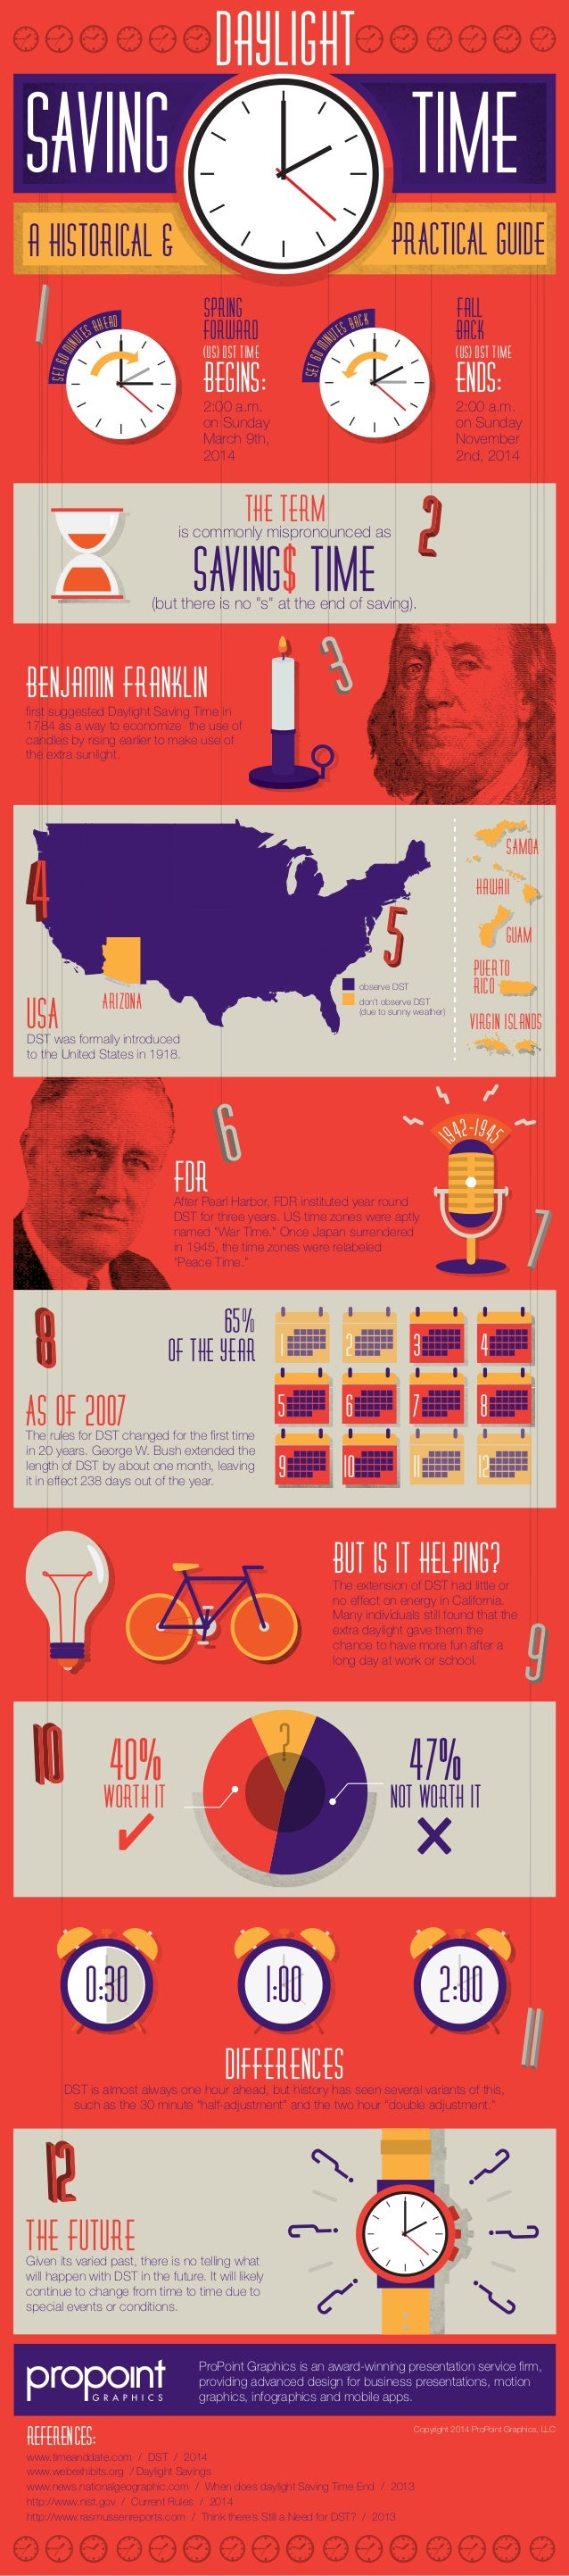 Daylight Saving Infographic